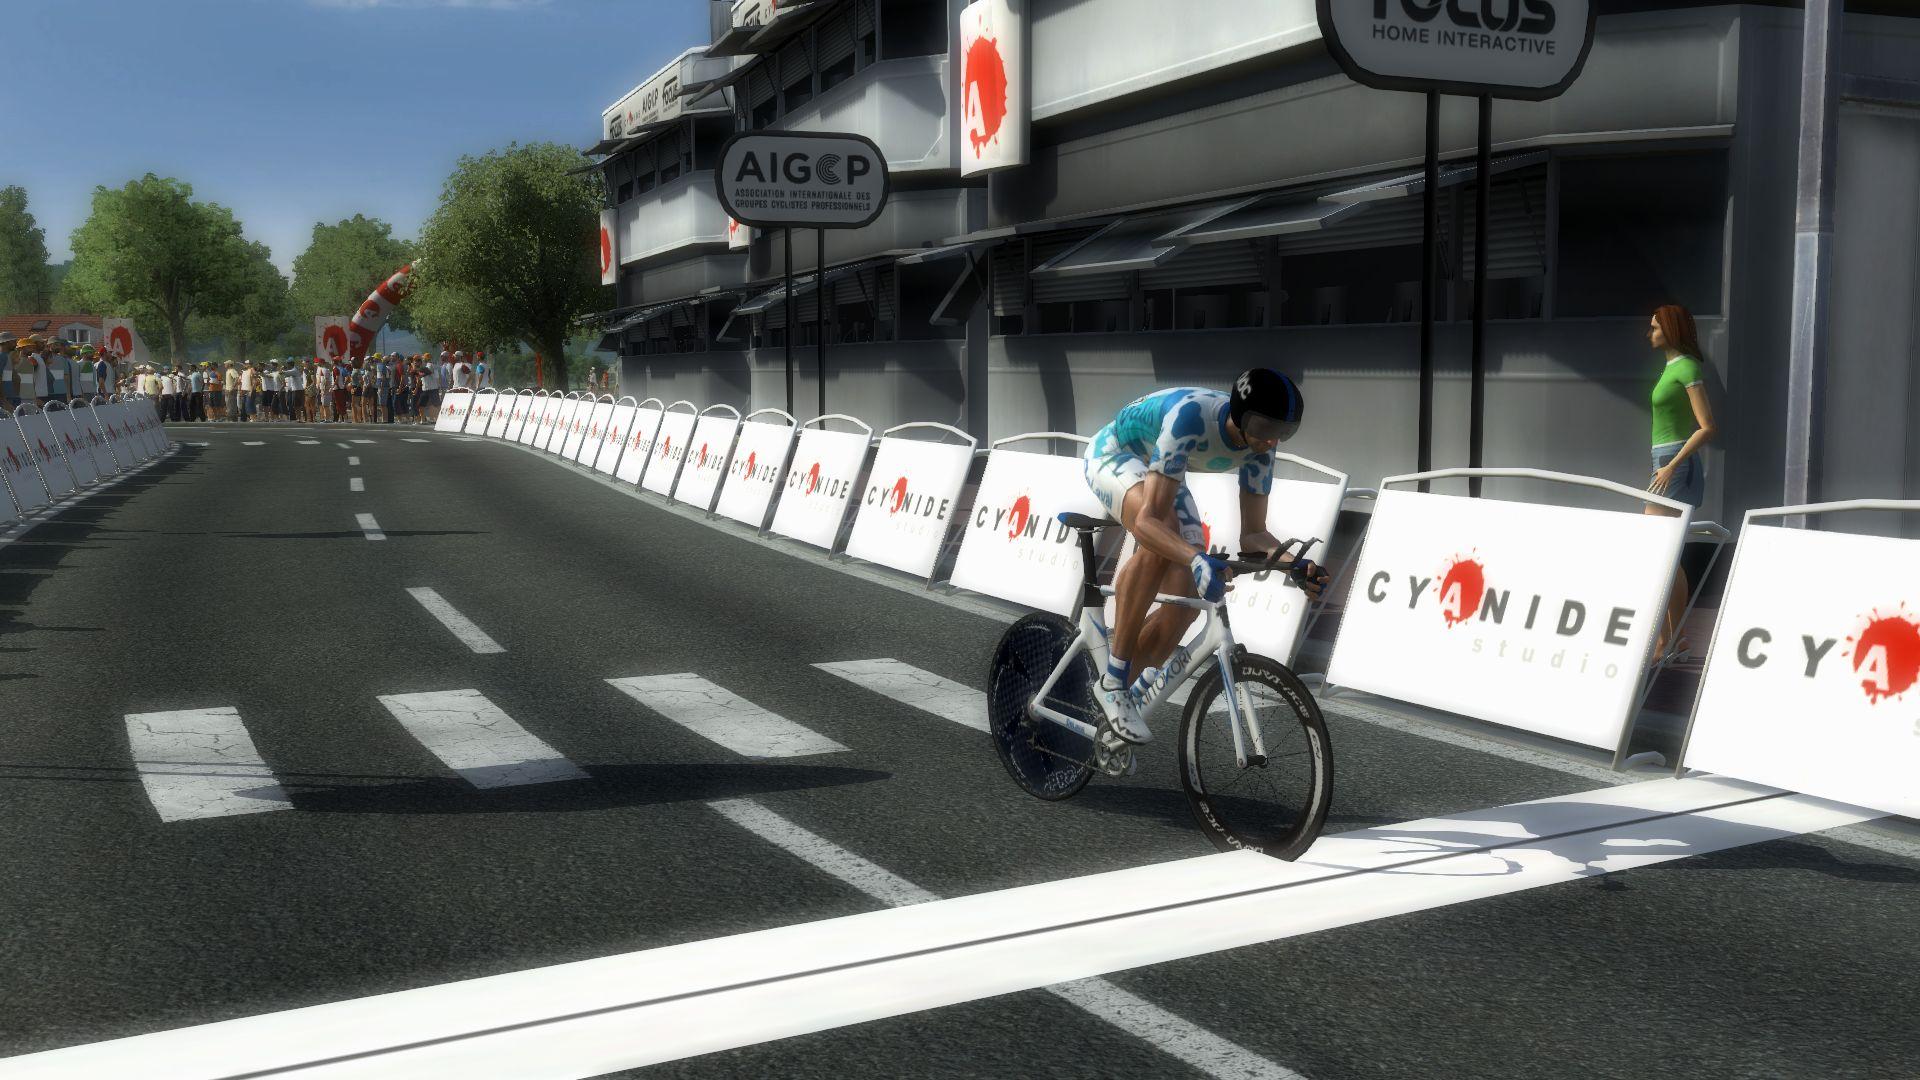 pcmdaily.com/images/mg/2019/Races/C1/Bayern/S4/mg19_bay_s04_16.jpg